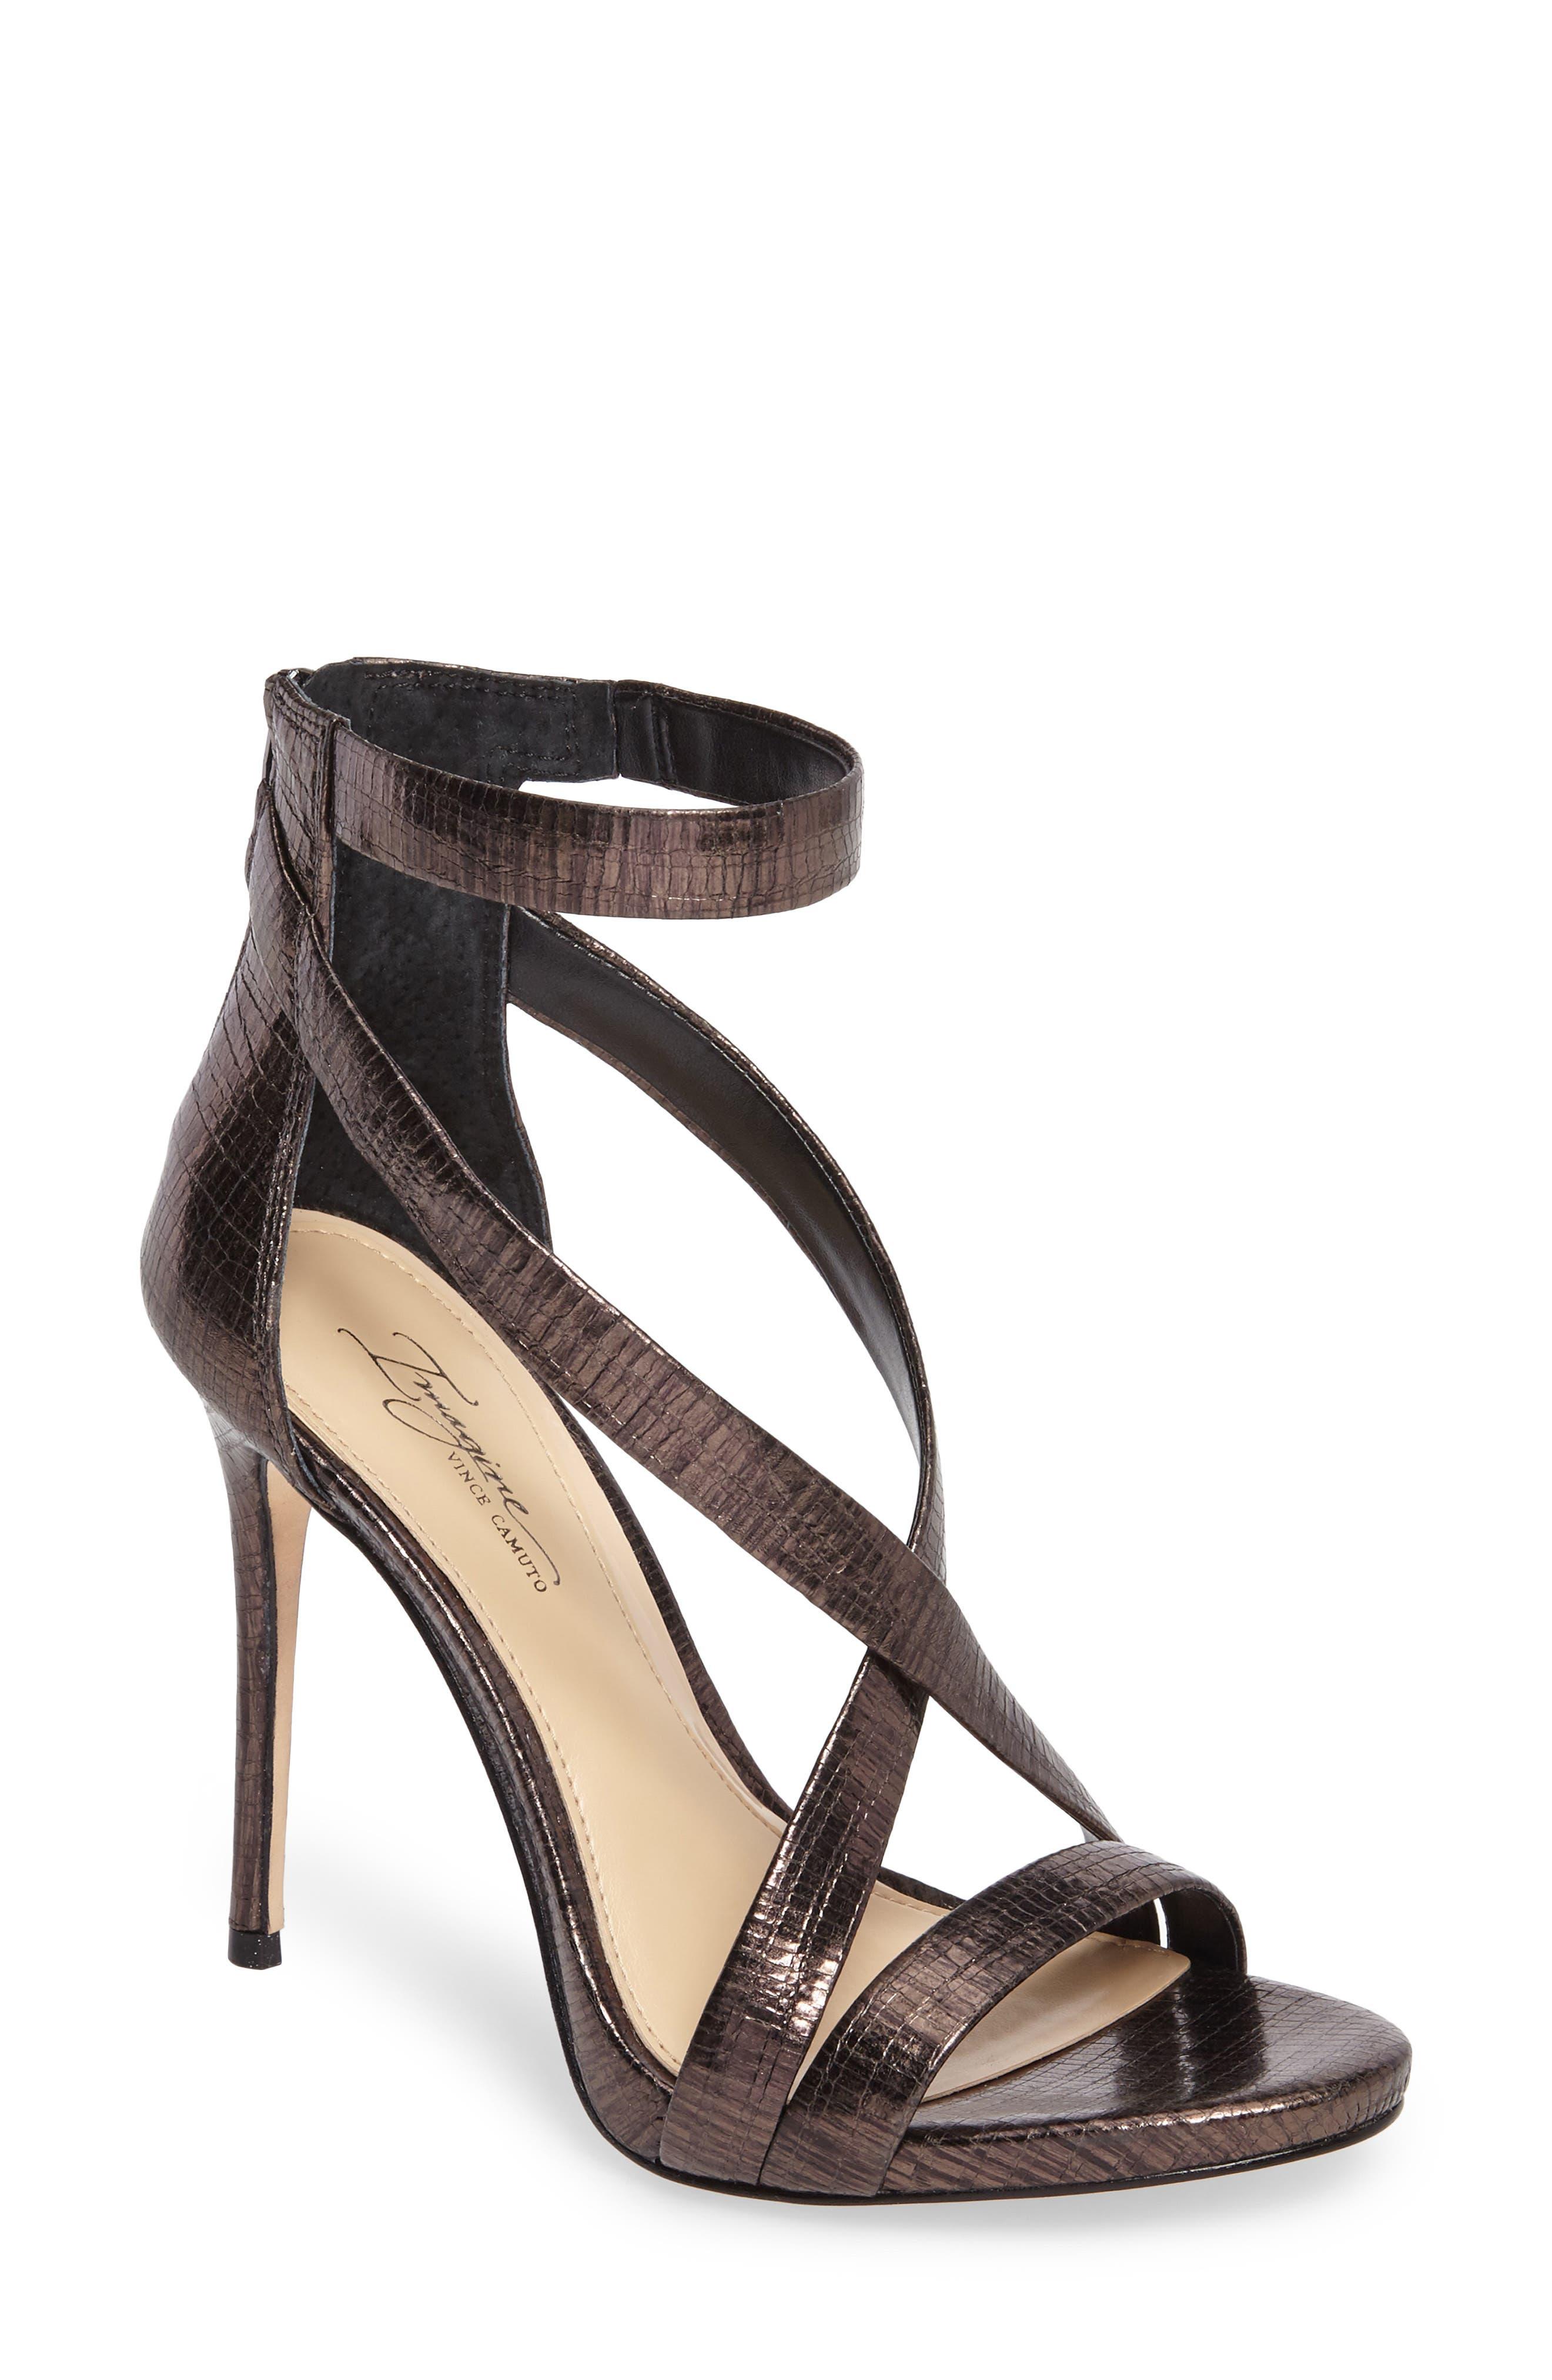 Alternate Image 1 Selected - Imagine Vince Camuto 'Devin' Sandal (Women)